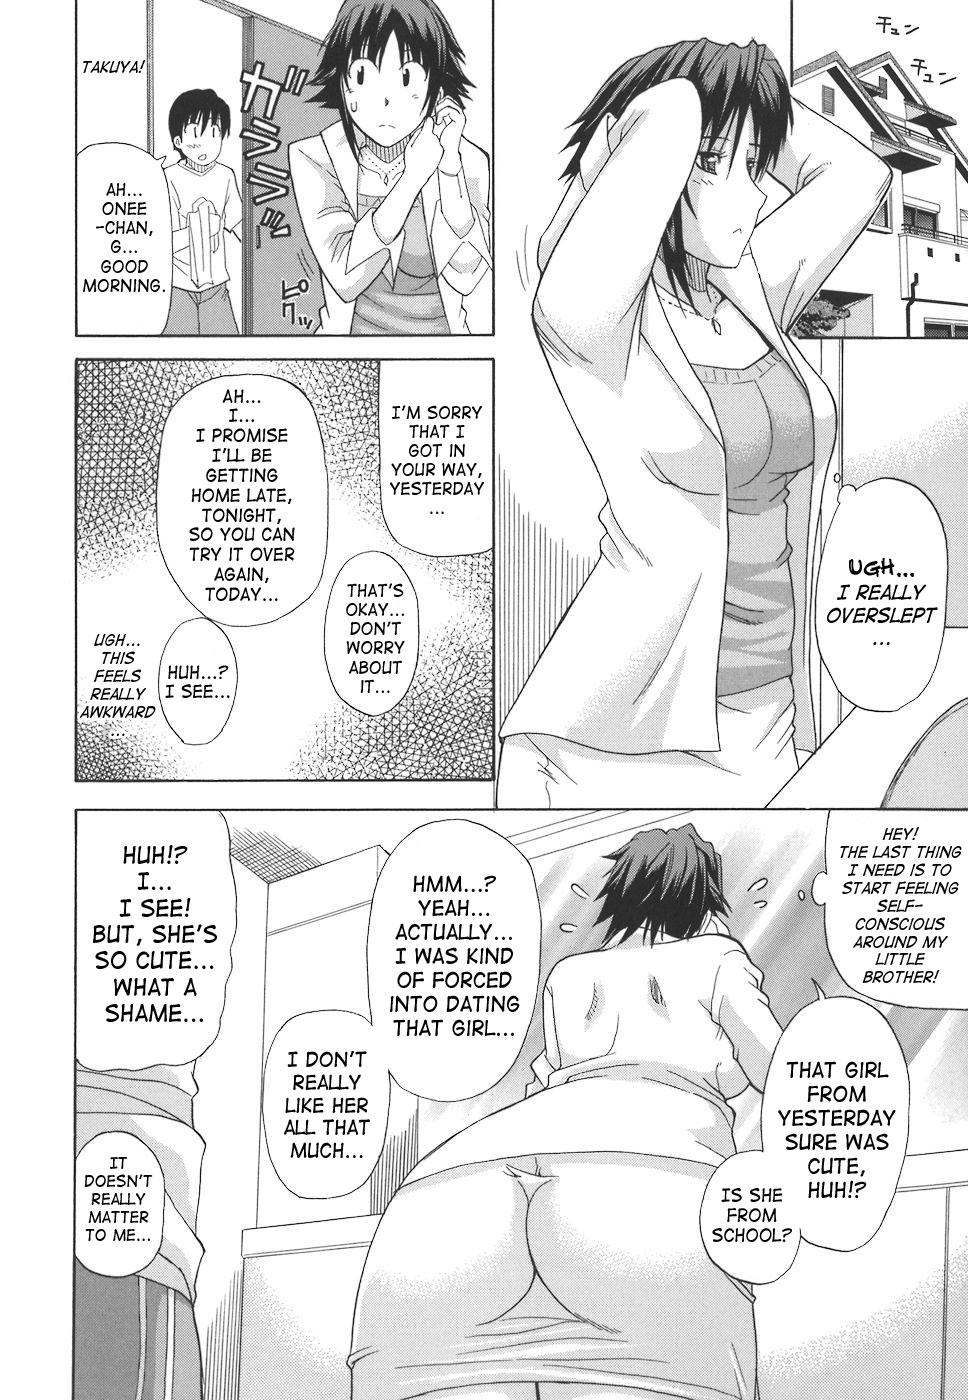 Ichizu na Toriko - A Earnest Captive 140